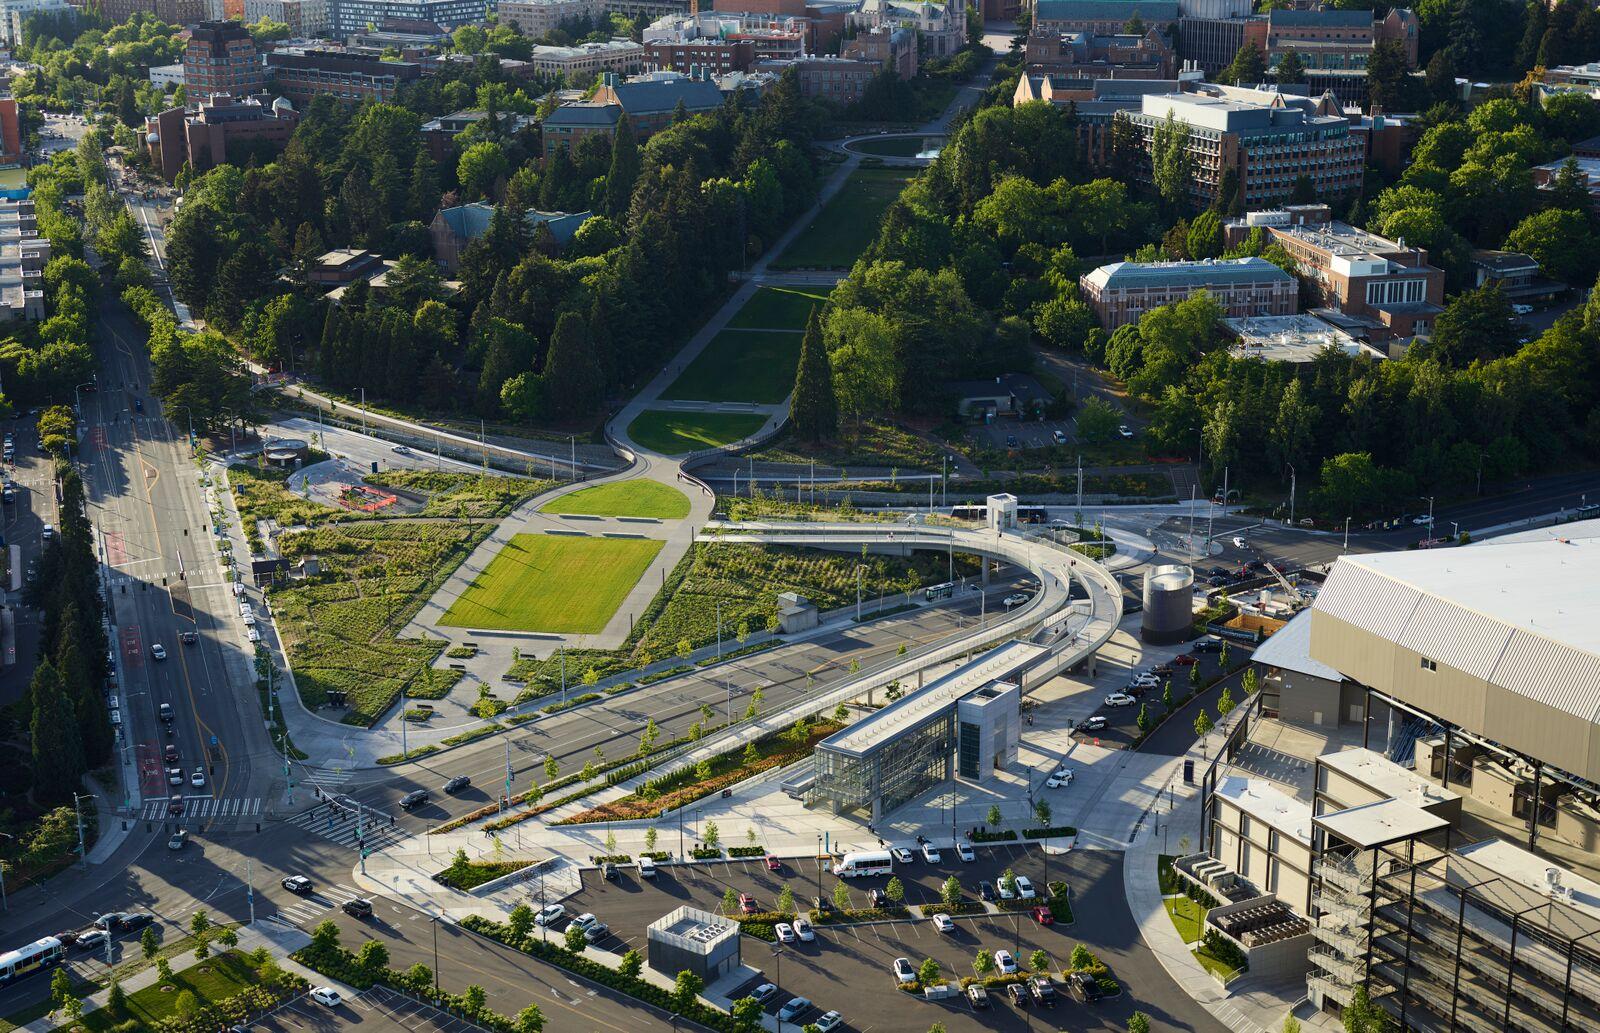 University of Washington Transit Station by LMN Architects